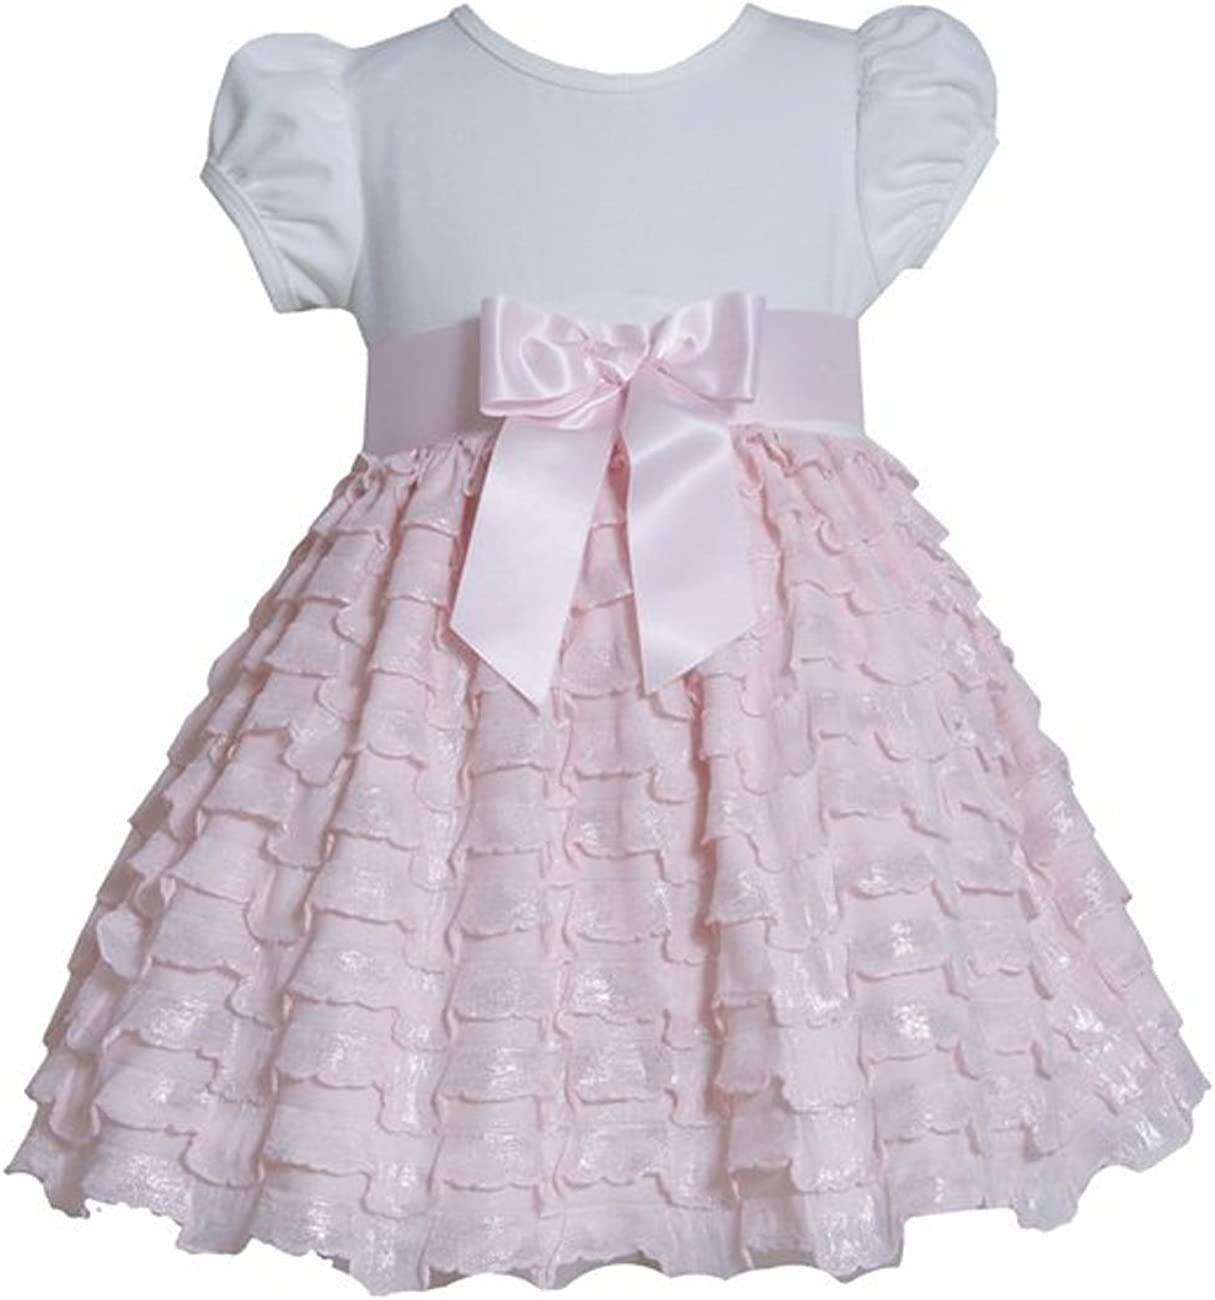 Bonnie Jean Girls 2T-4T Pink Ivory Knit to Foil Eyelash Ruffle Tier Birthday Dress